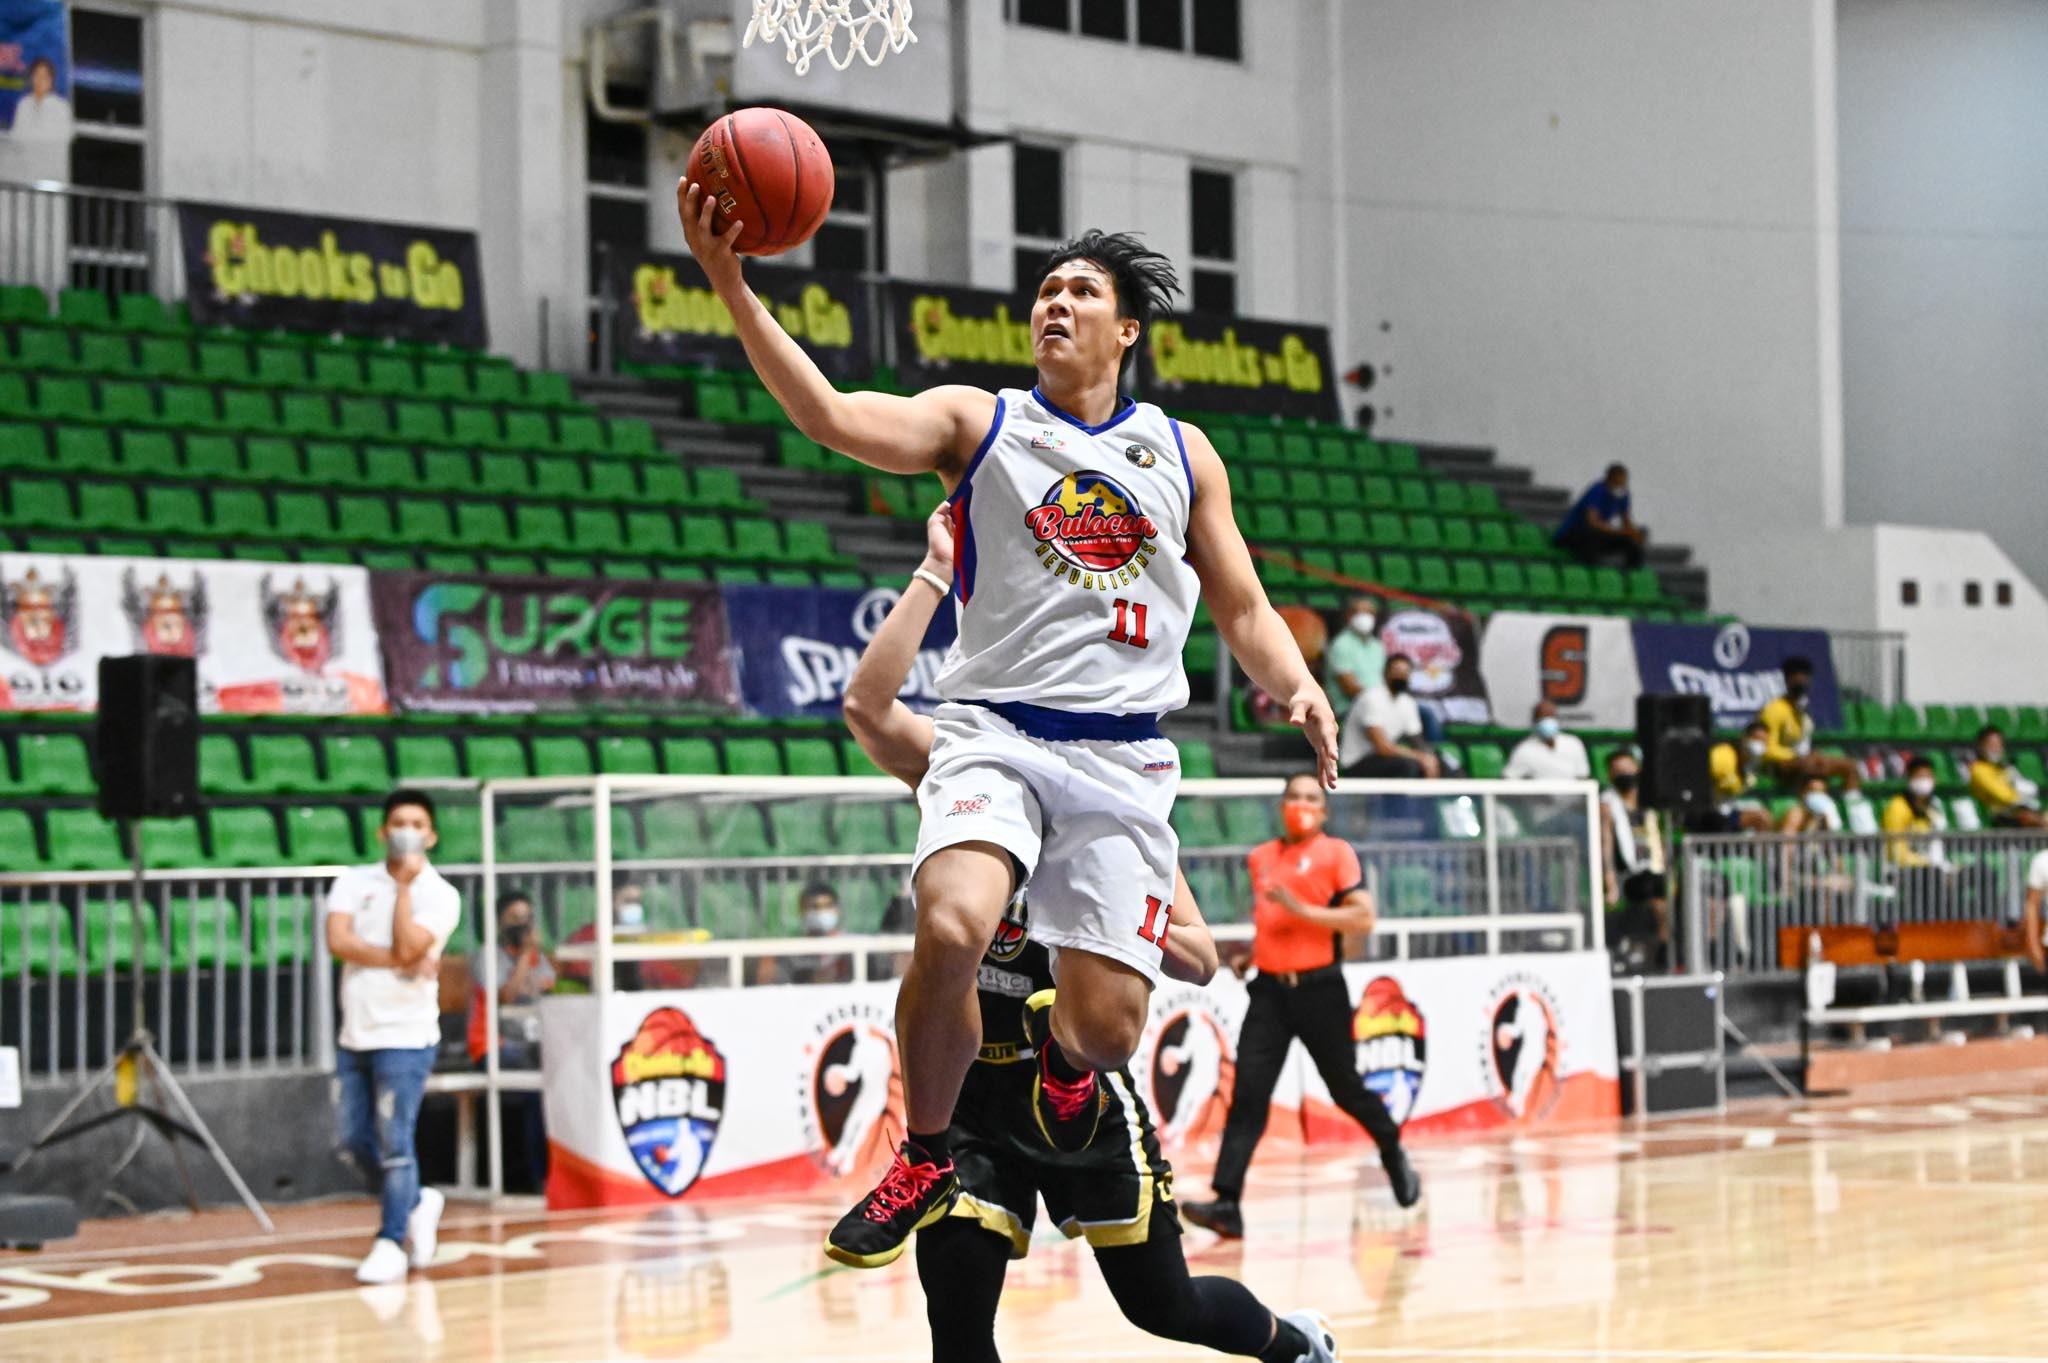 2021-Chooks-NBL-Bulacan-vs-Pampanga-Ernest-Reyes Mark Tamayo's halfcourt prayer does not count as Bulacan stuns Pampanga in NBL Basketball NBL News  - philippine sports news